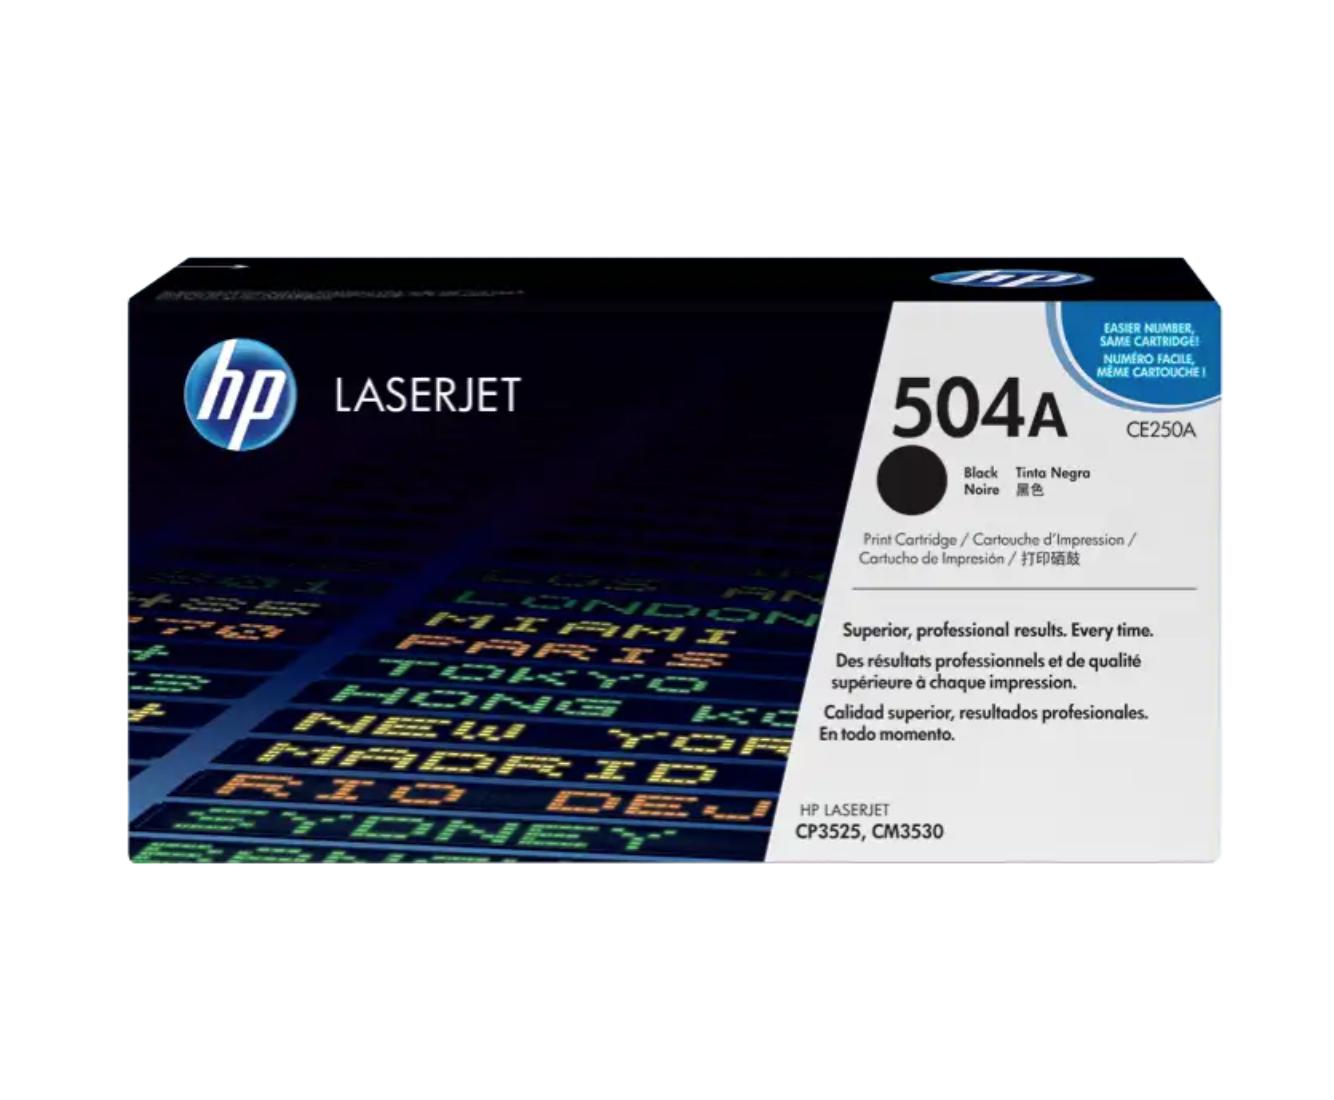 HP 504A 黑色原廠 LaserJet 碳粉 CE250A